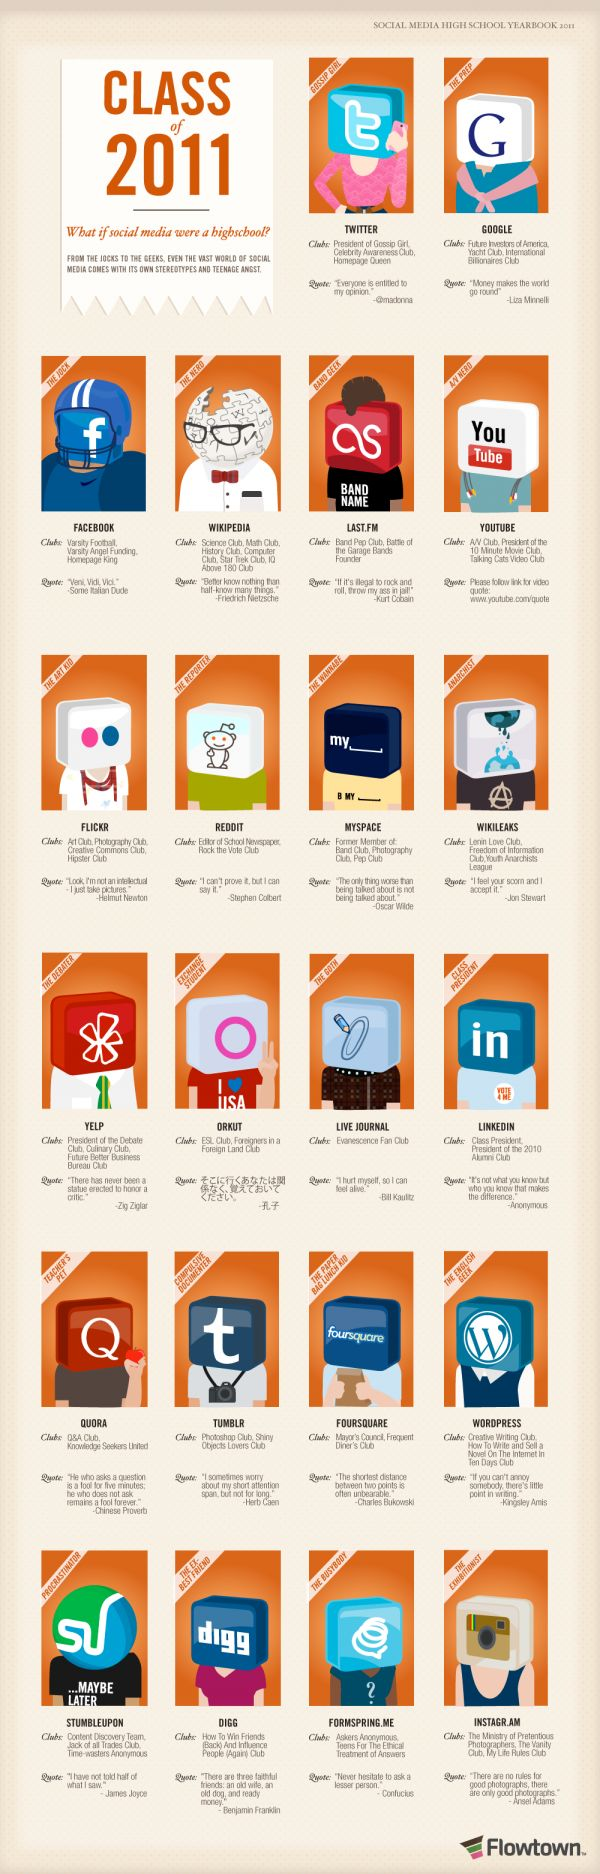 Social Media Highschool Infographic #nerdgraph